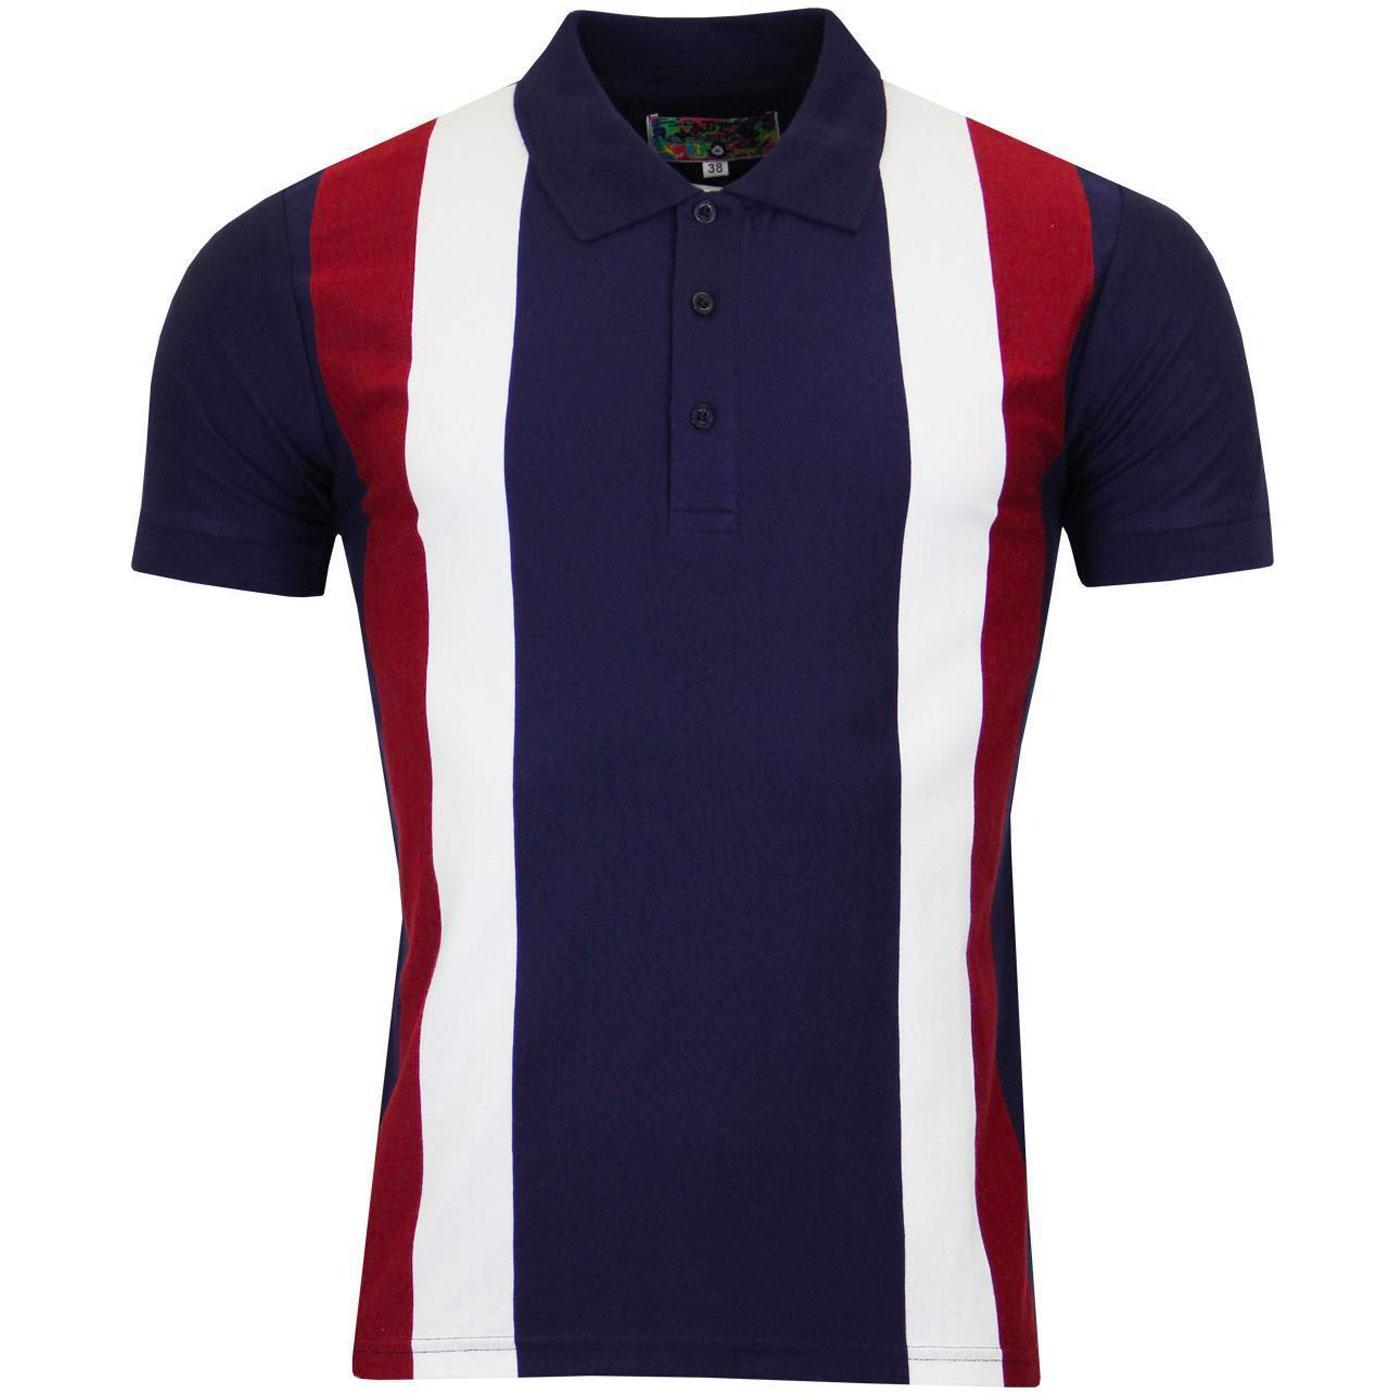 Madcap England Men's Retro Mod Stripe Panel Jersey Polo Shirt in Peacoat